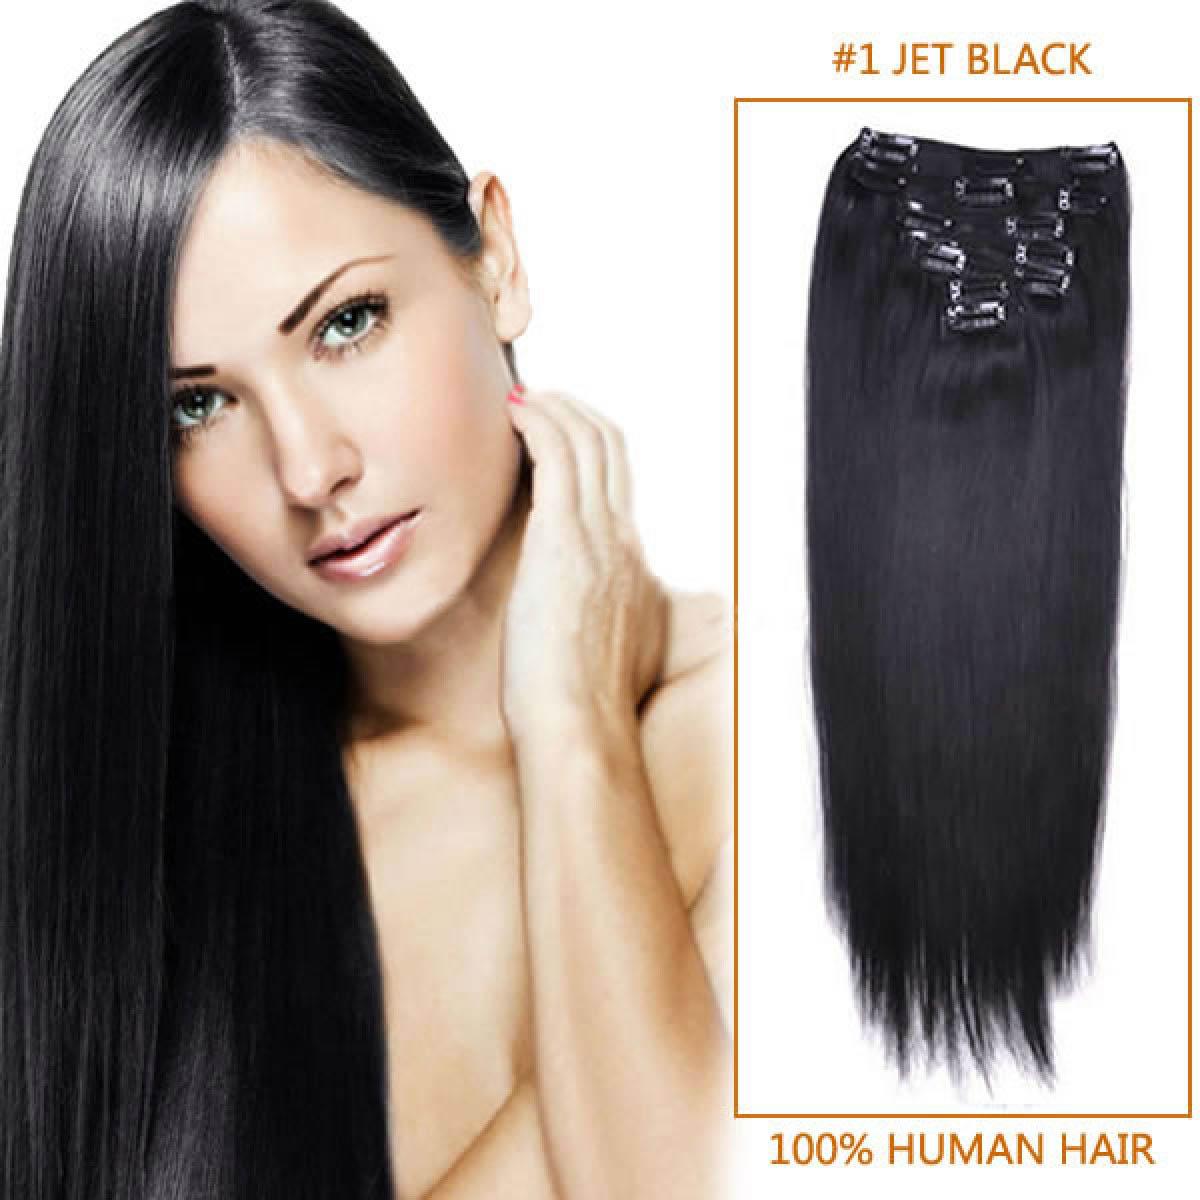 Inch 1 jet black clip in remy human hair extensions 9pcs 30 inch 1 jet black clip in remy human hair extensions 9pcs pmusecretfo Gallery